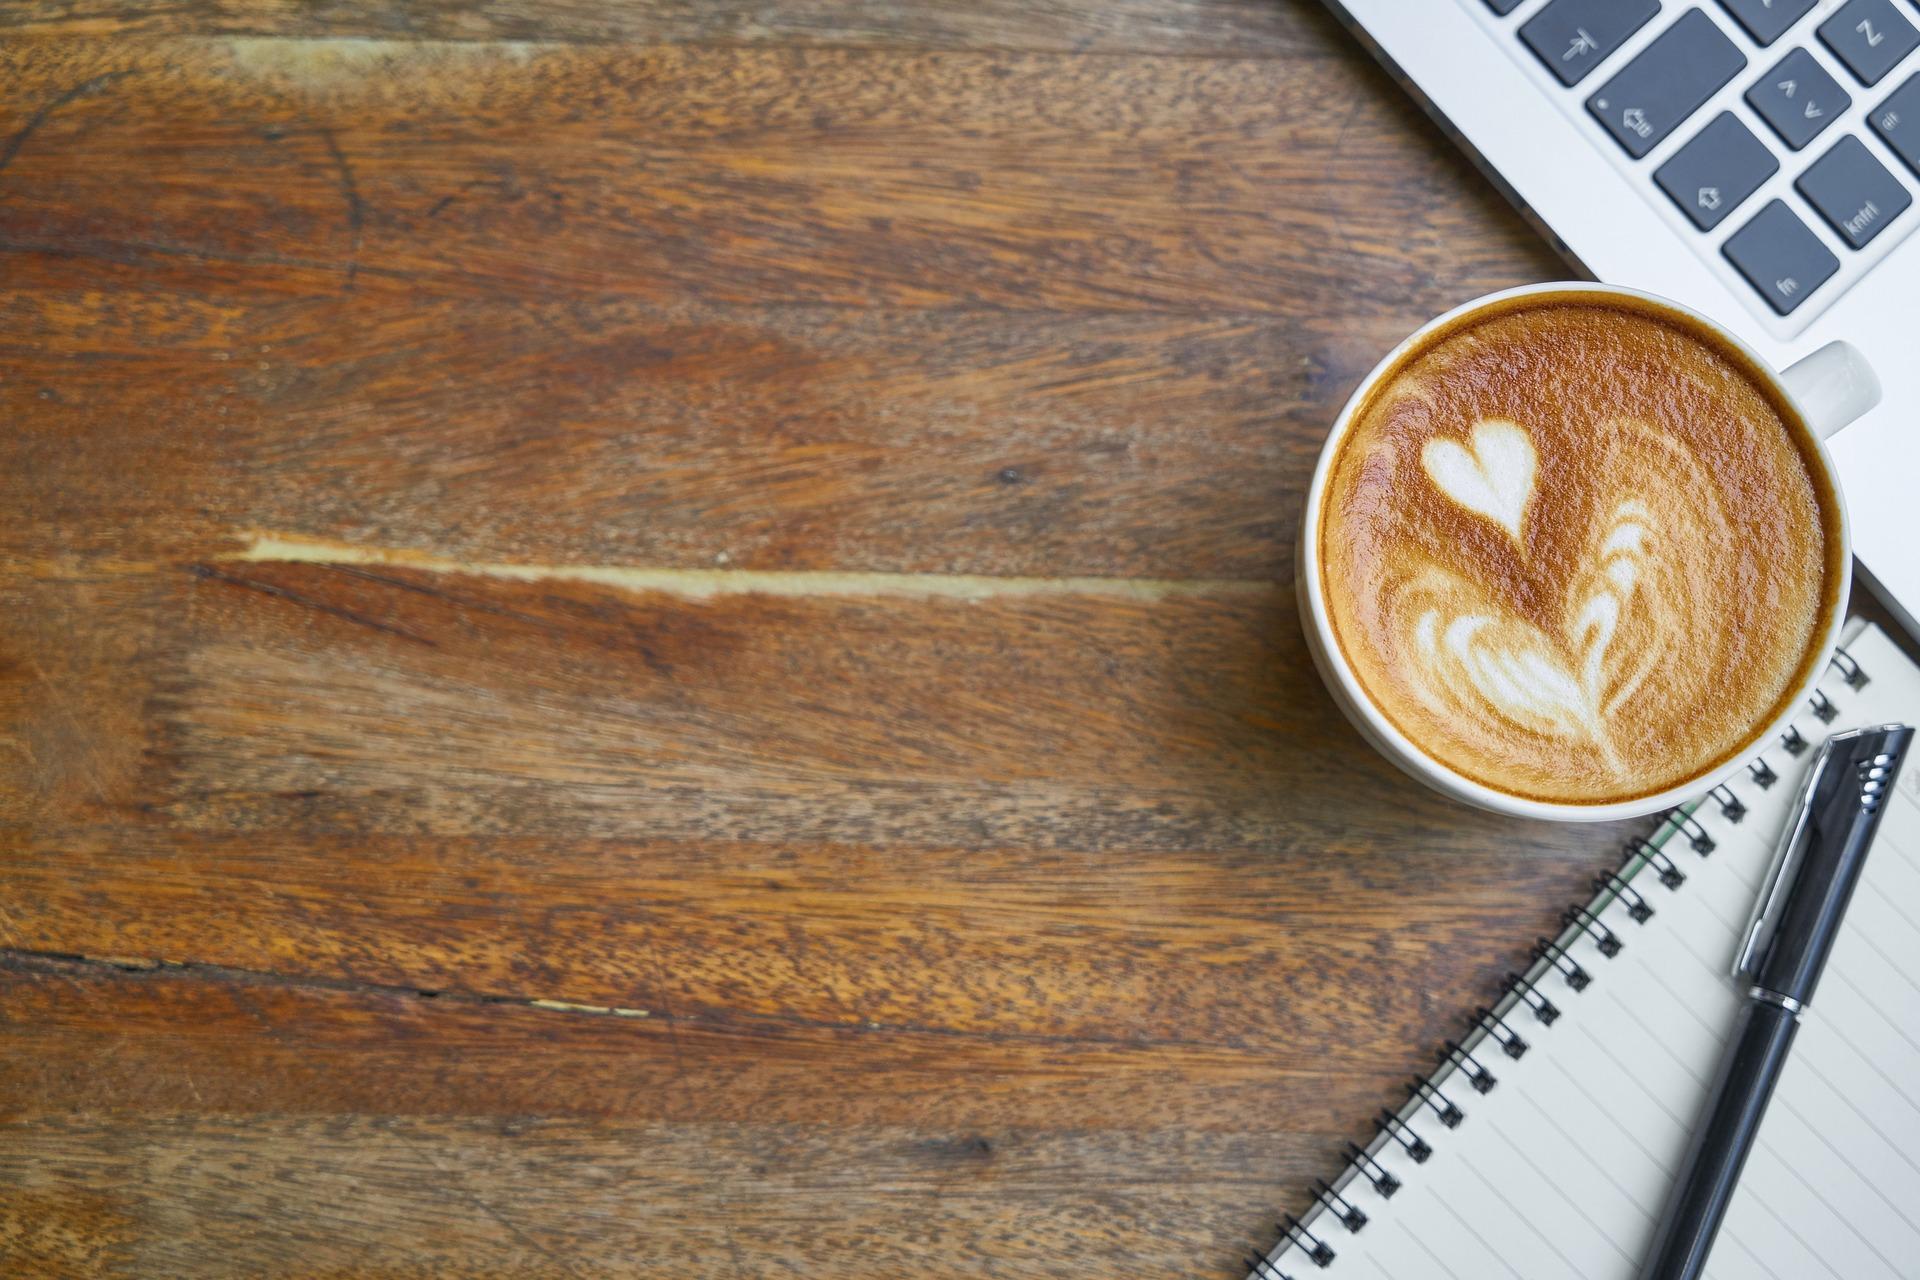 kaffe, bord, computer, arbejde